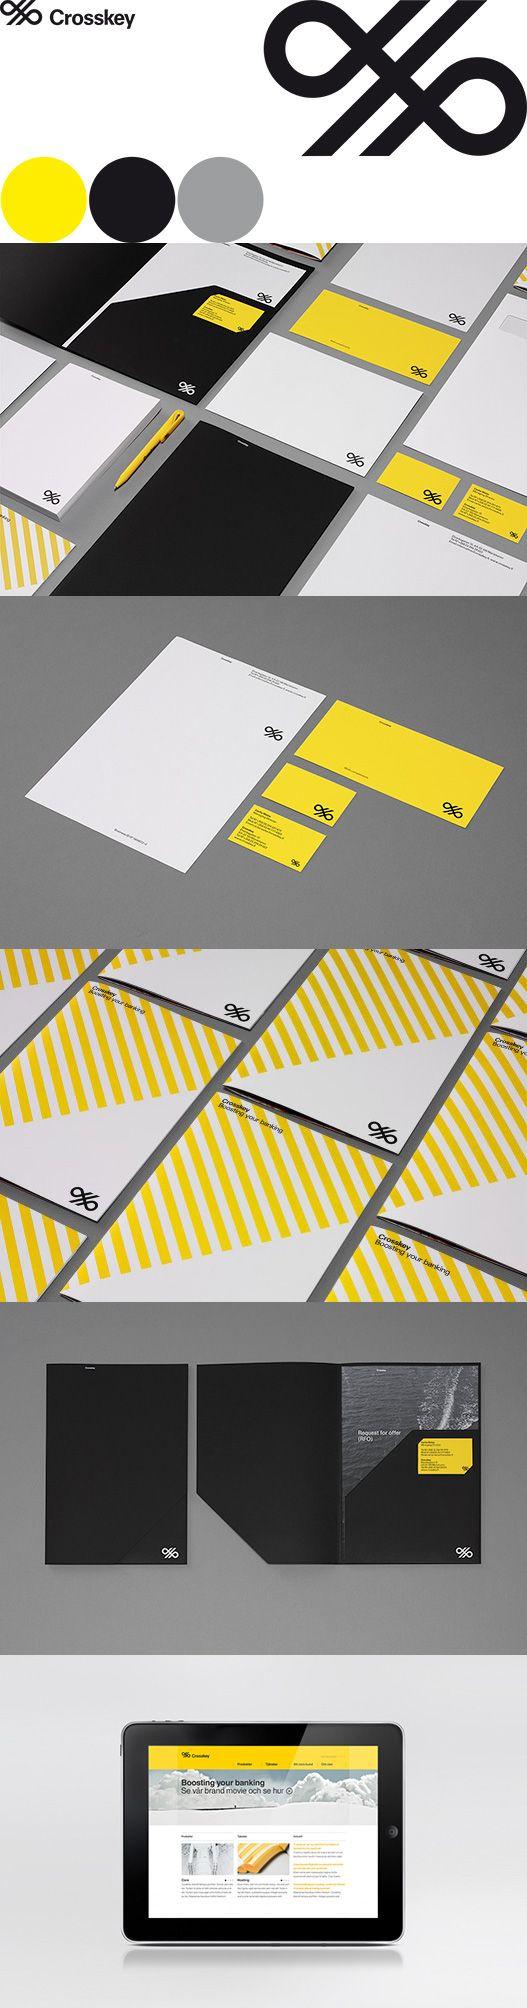 Crosskey Brand Identity - Agency: Kurppa Hosk. Love the folder template